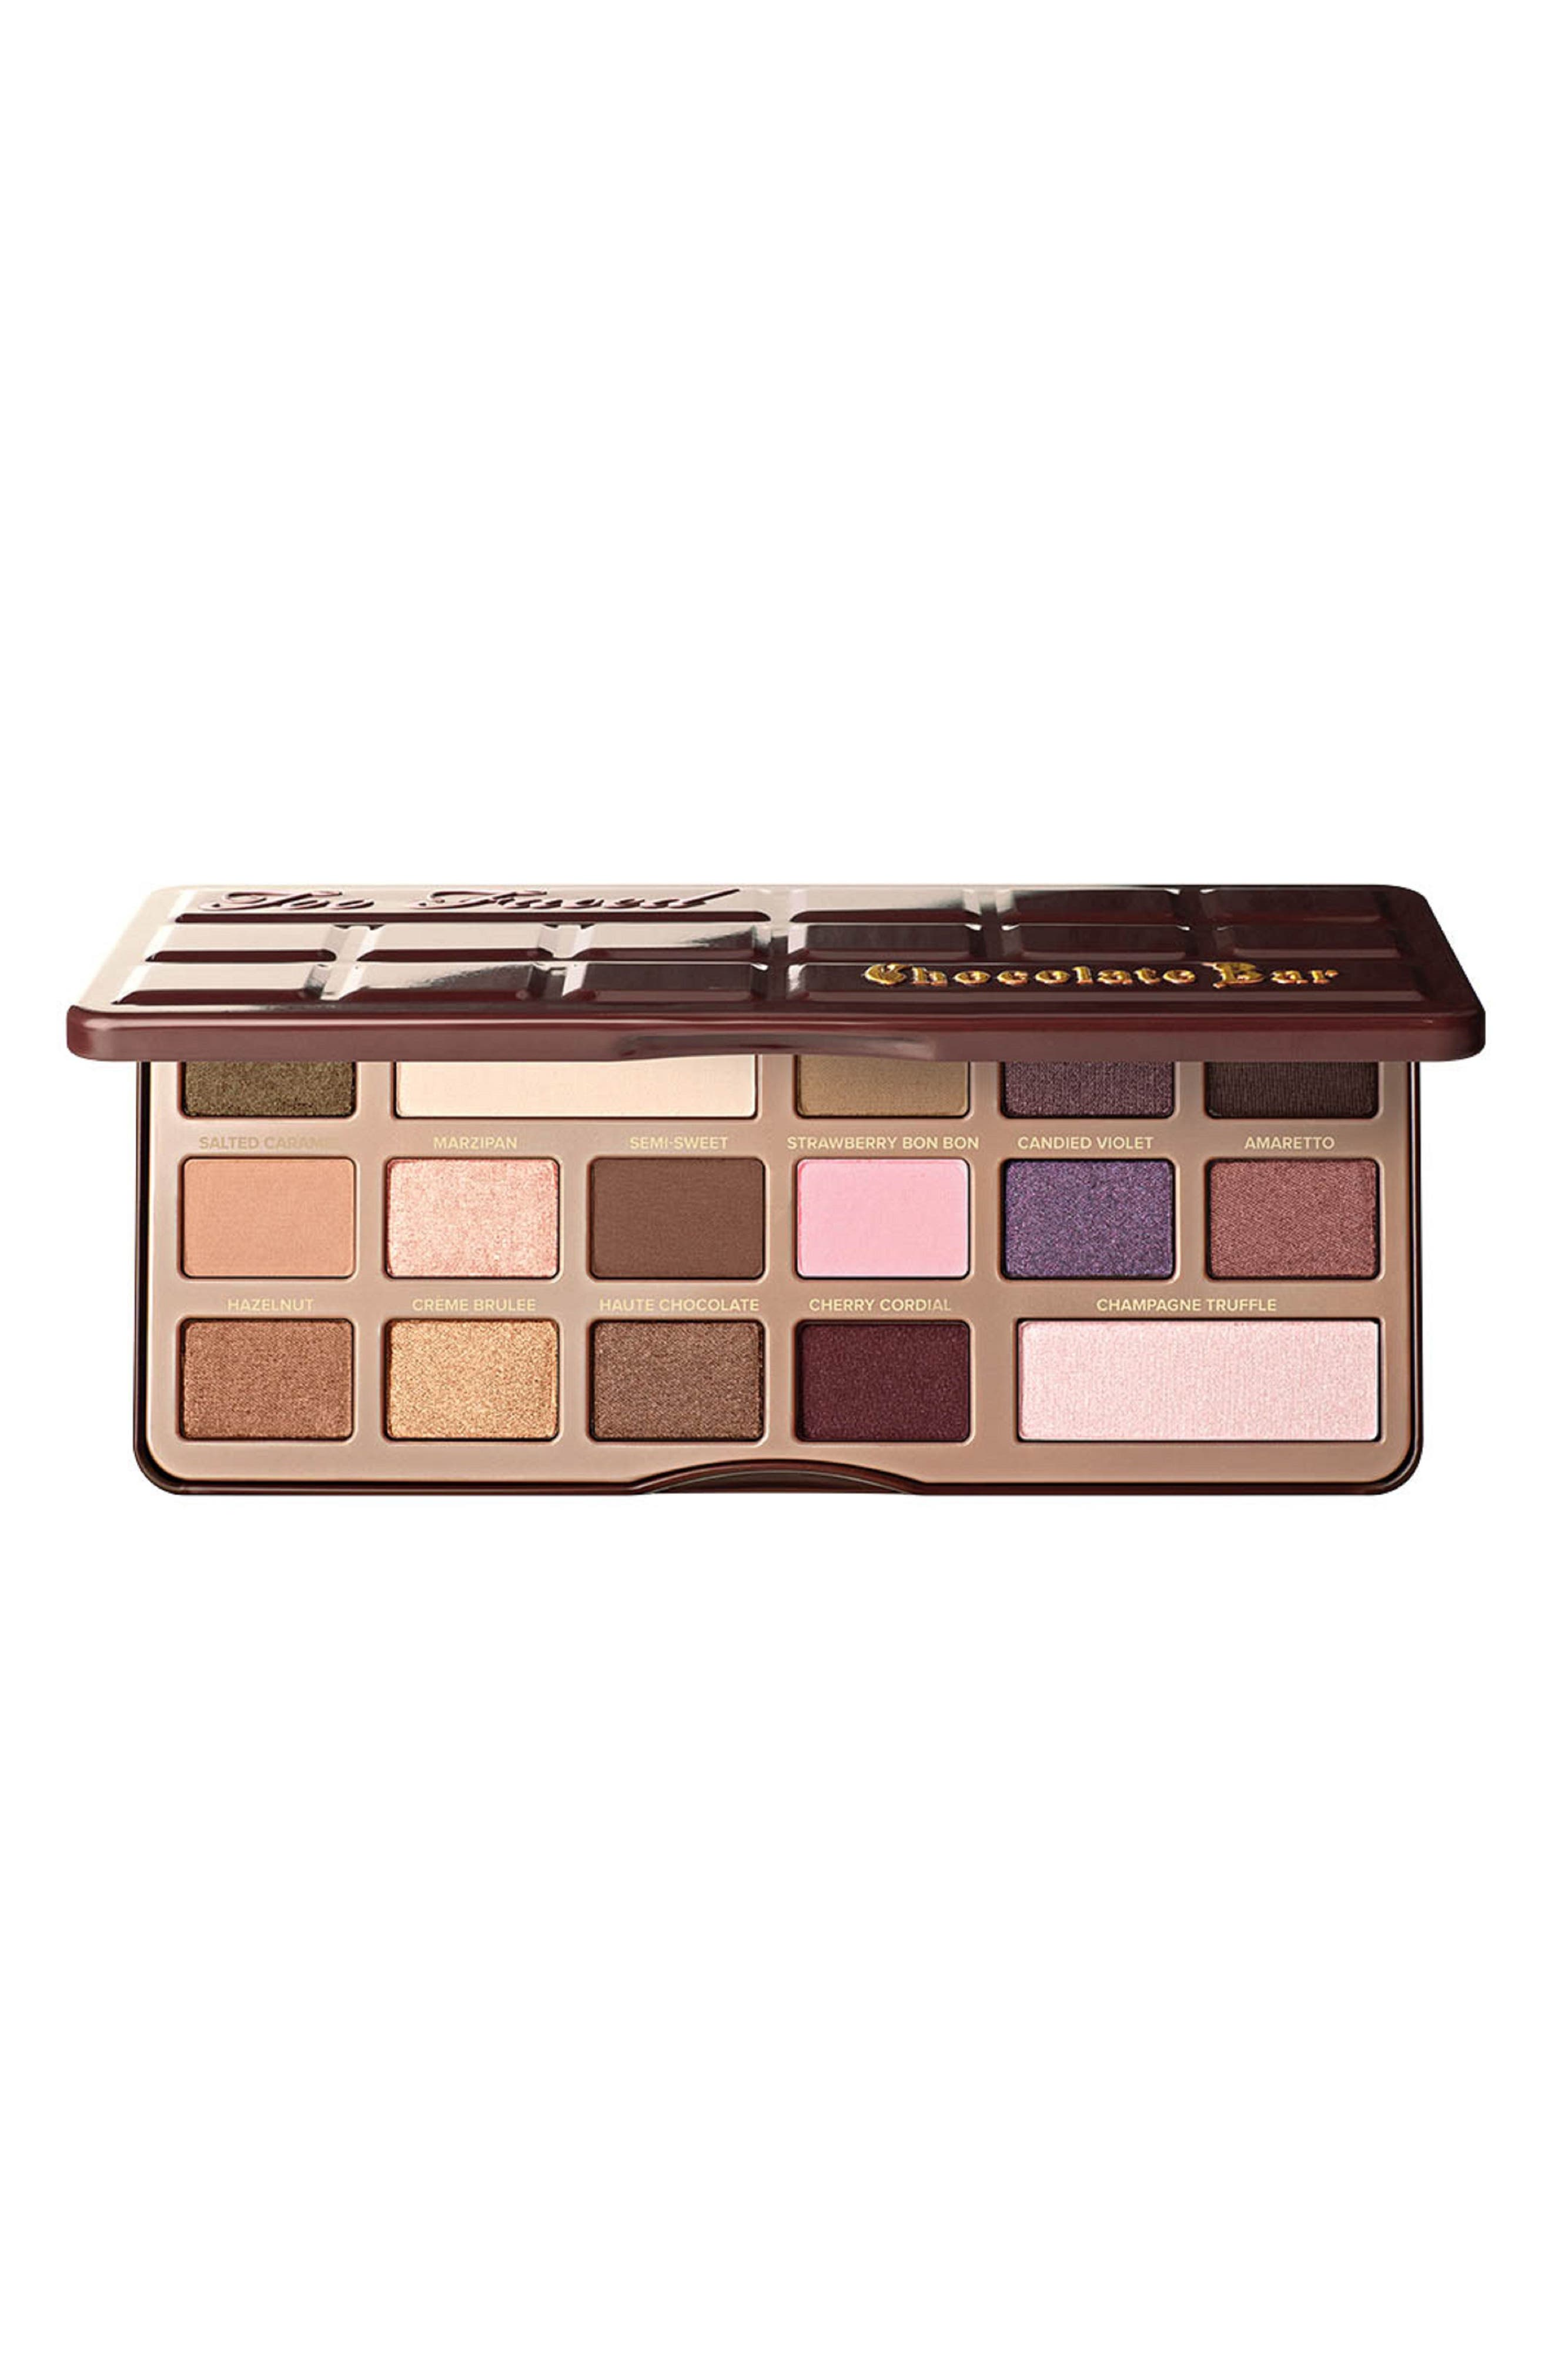 Chocolate Bar Eyeshadow Palette,                         Main,                         color, No Color